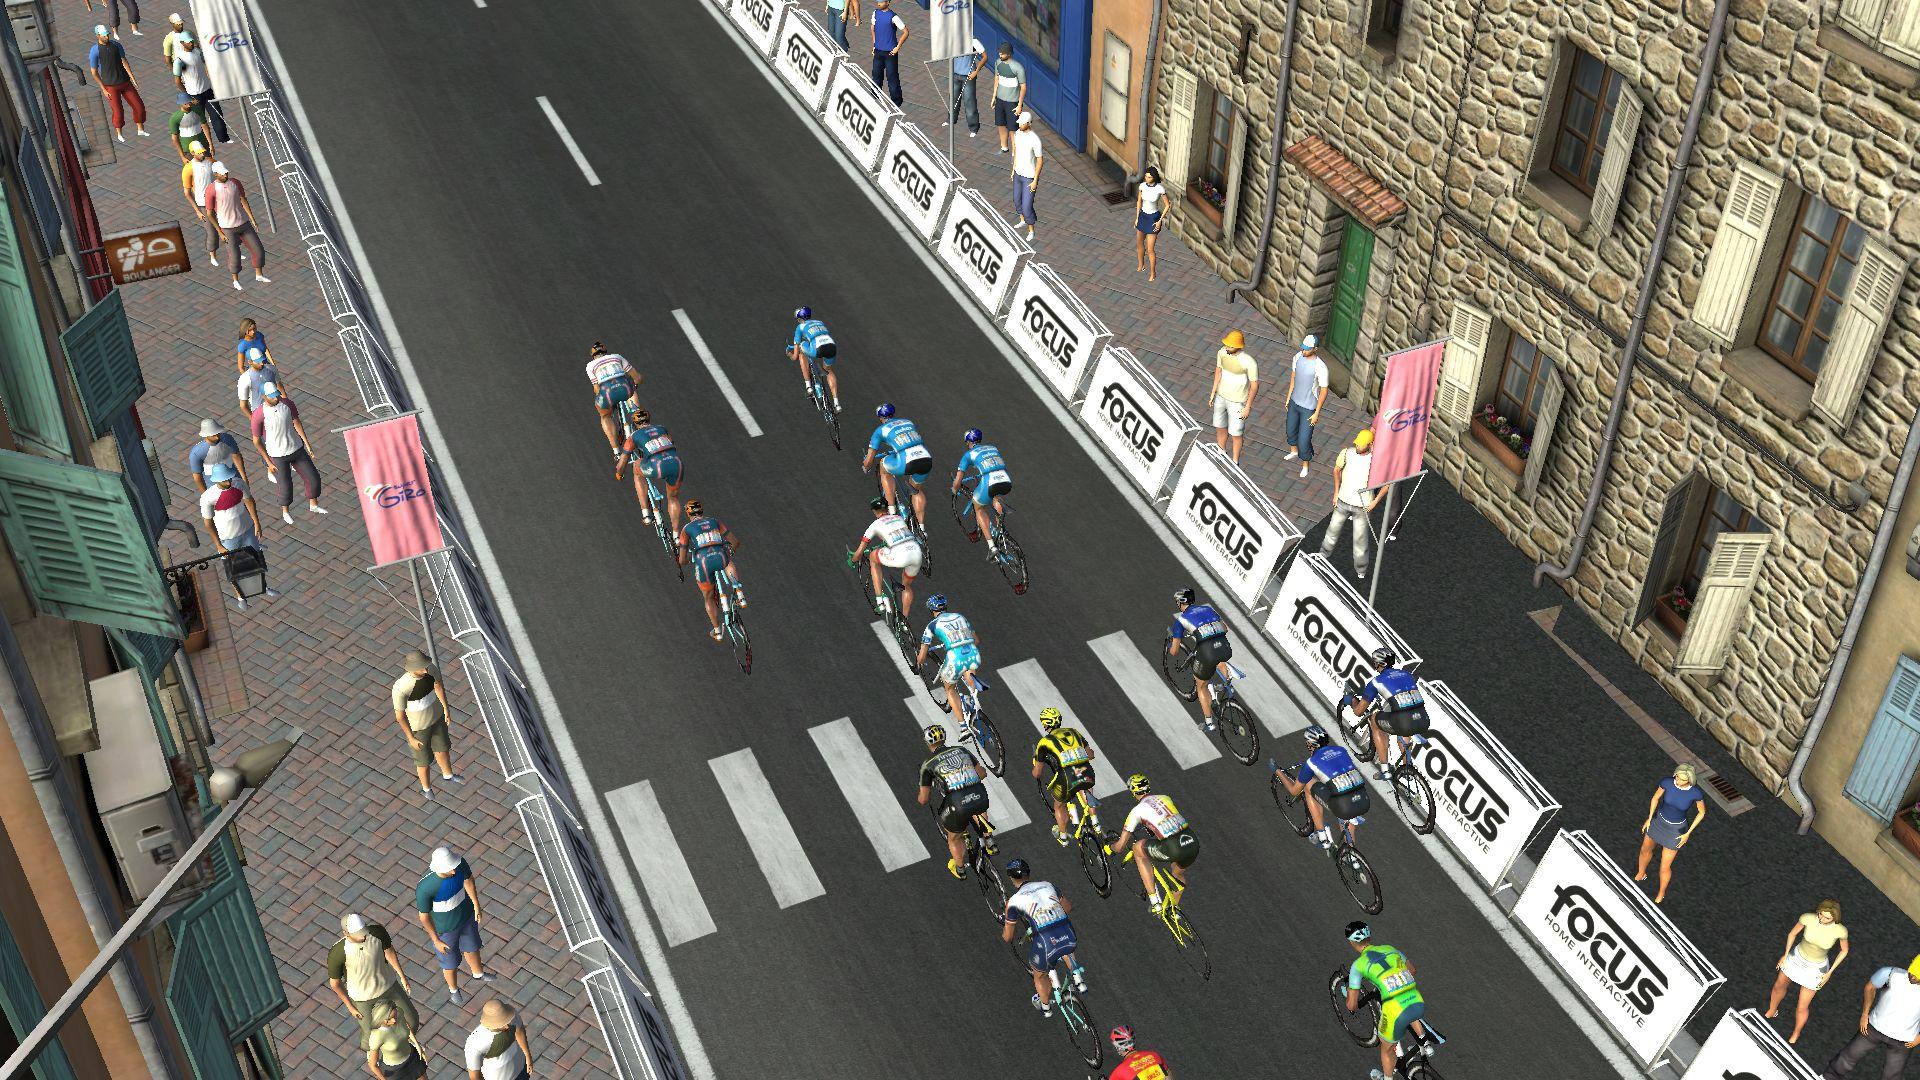 pcmdaily.com/images/mg/2019/Races/GTM/Giro/mg19_giro_10_PCM0125.jpg